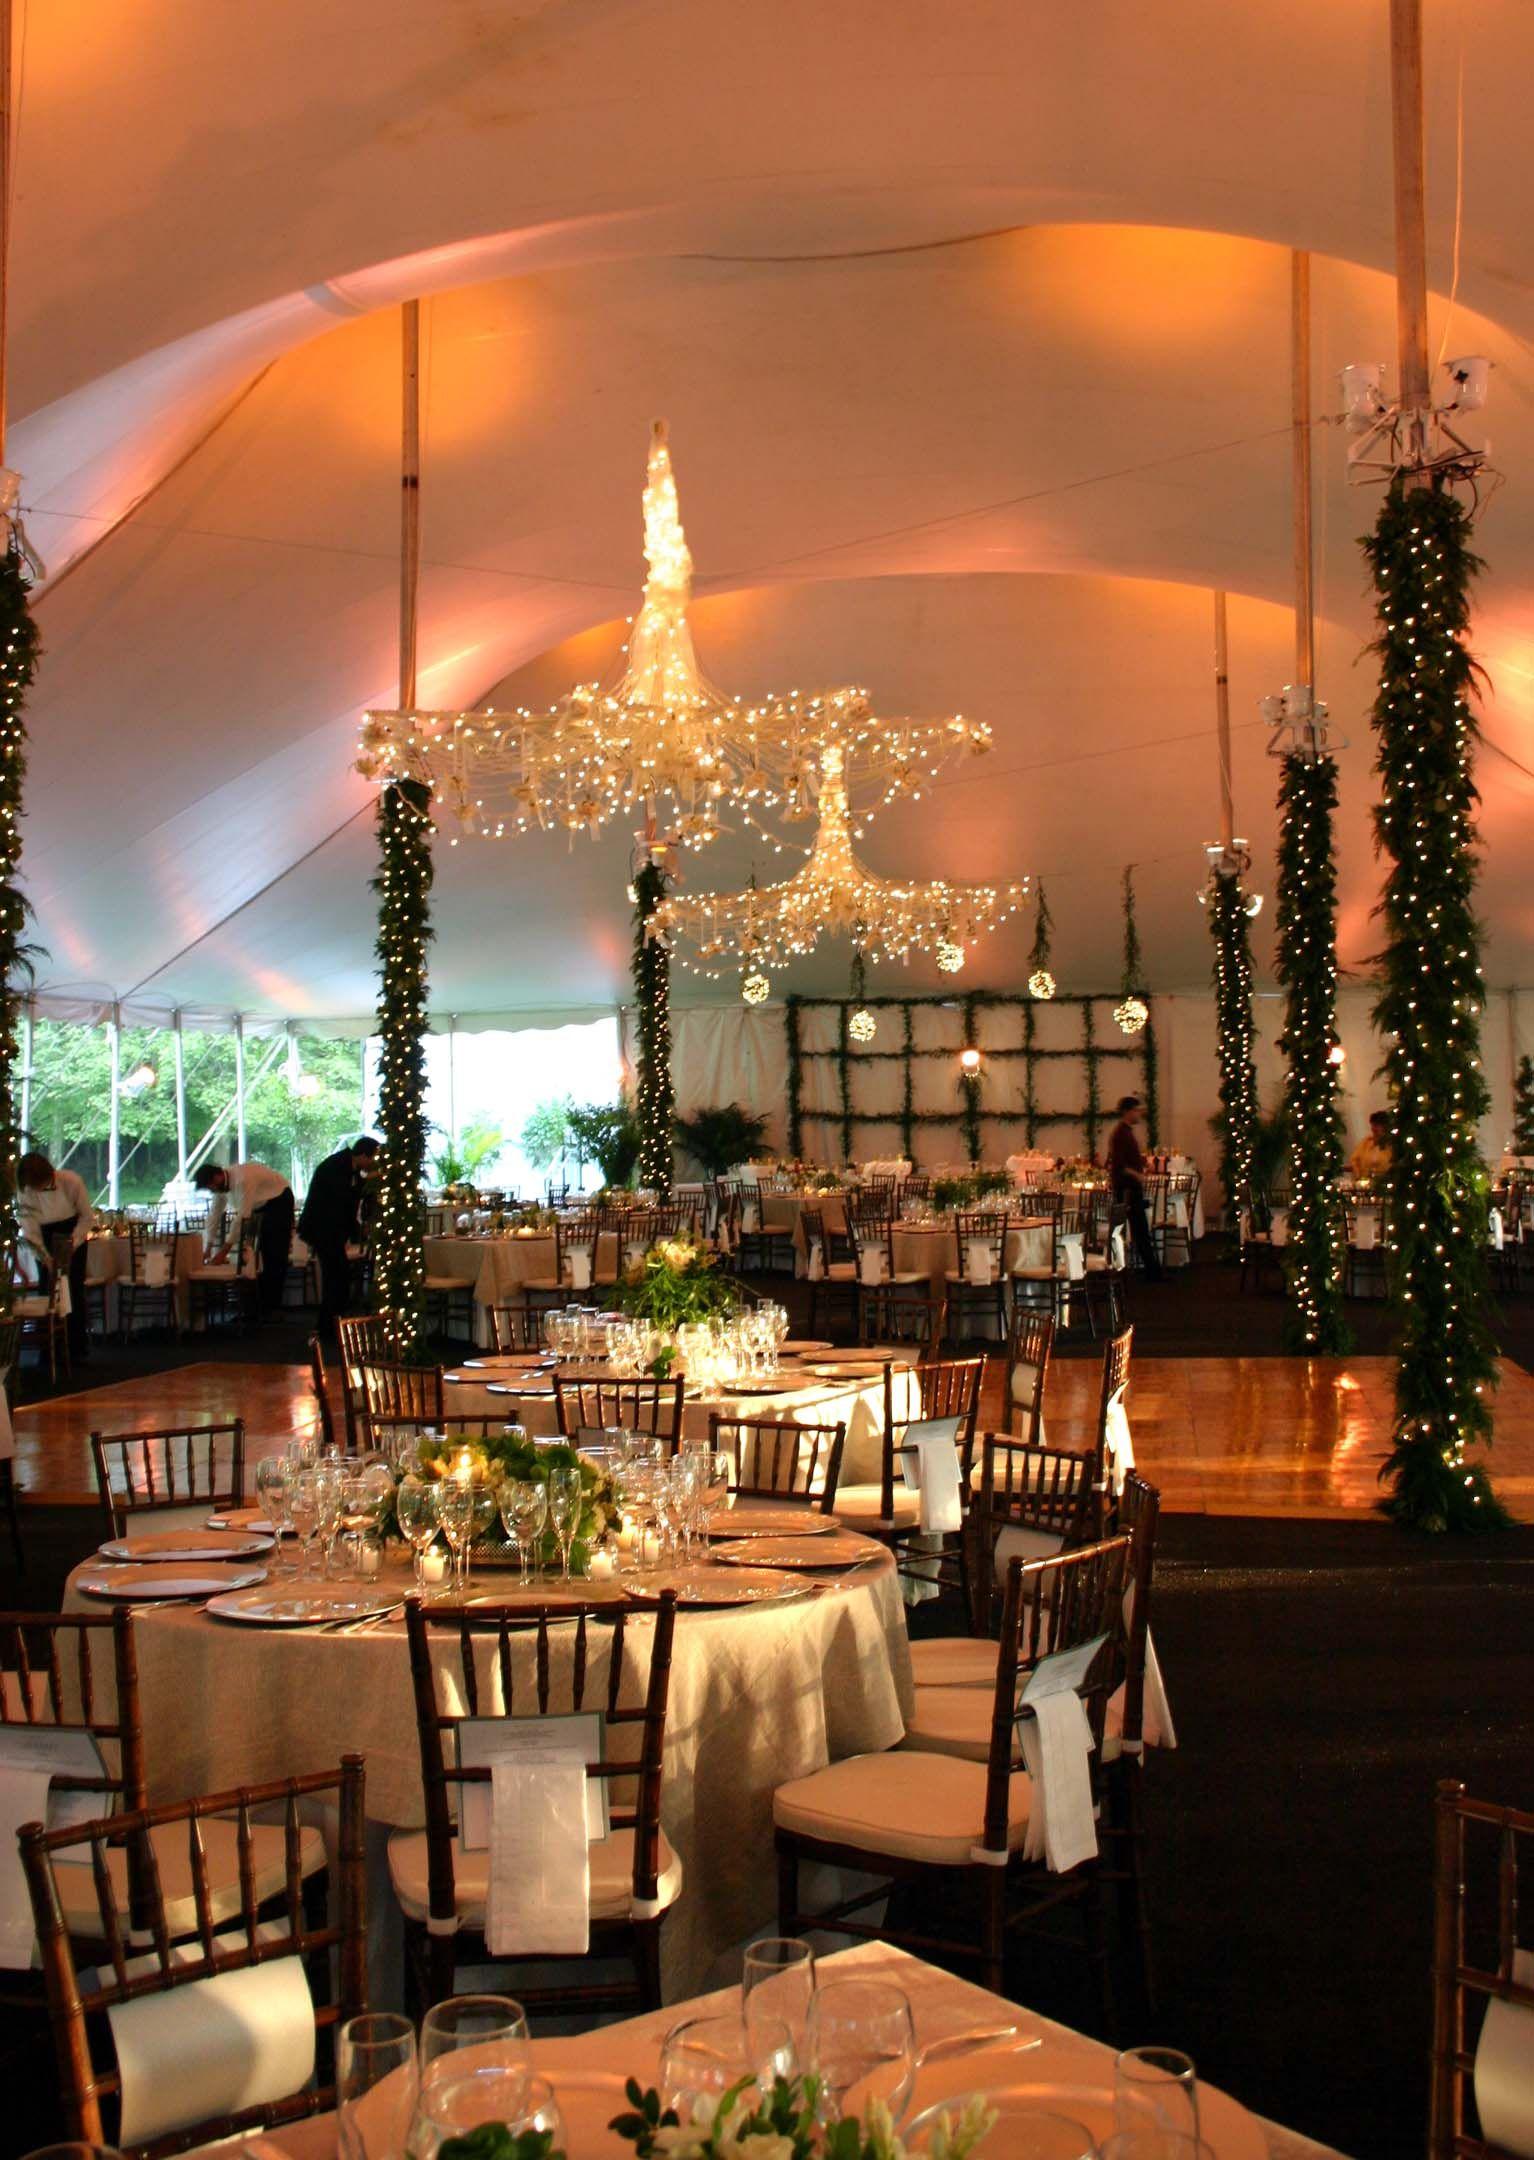 High peak pole tent Tent reception, Wedding decorations